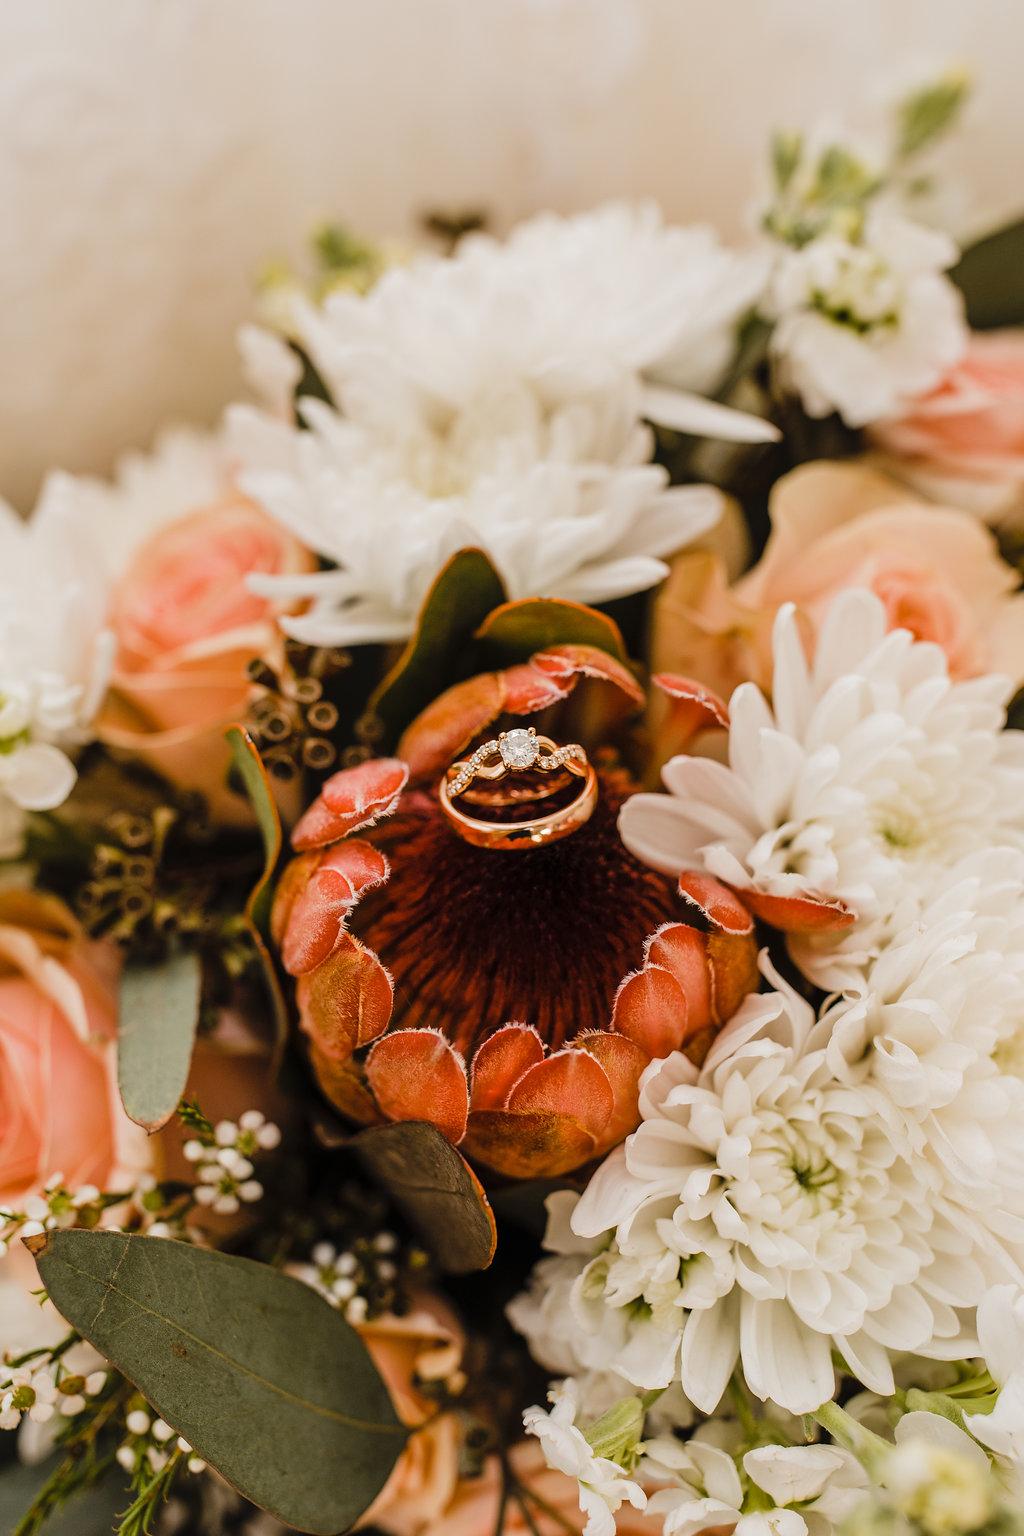 bouquet ring shot wedding day detail photography orange flowers rose gold